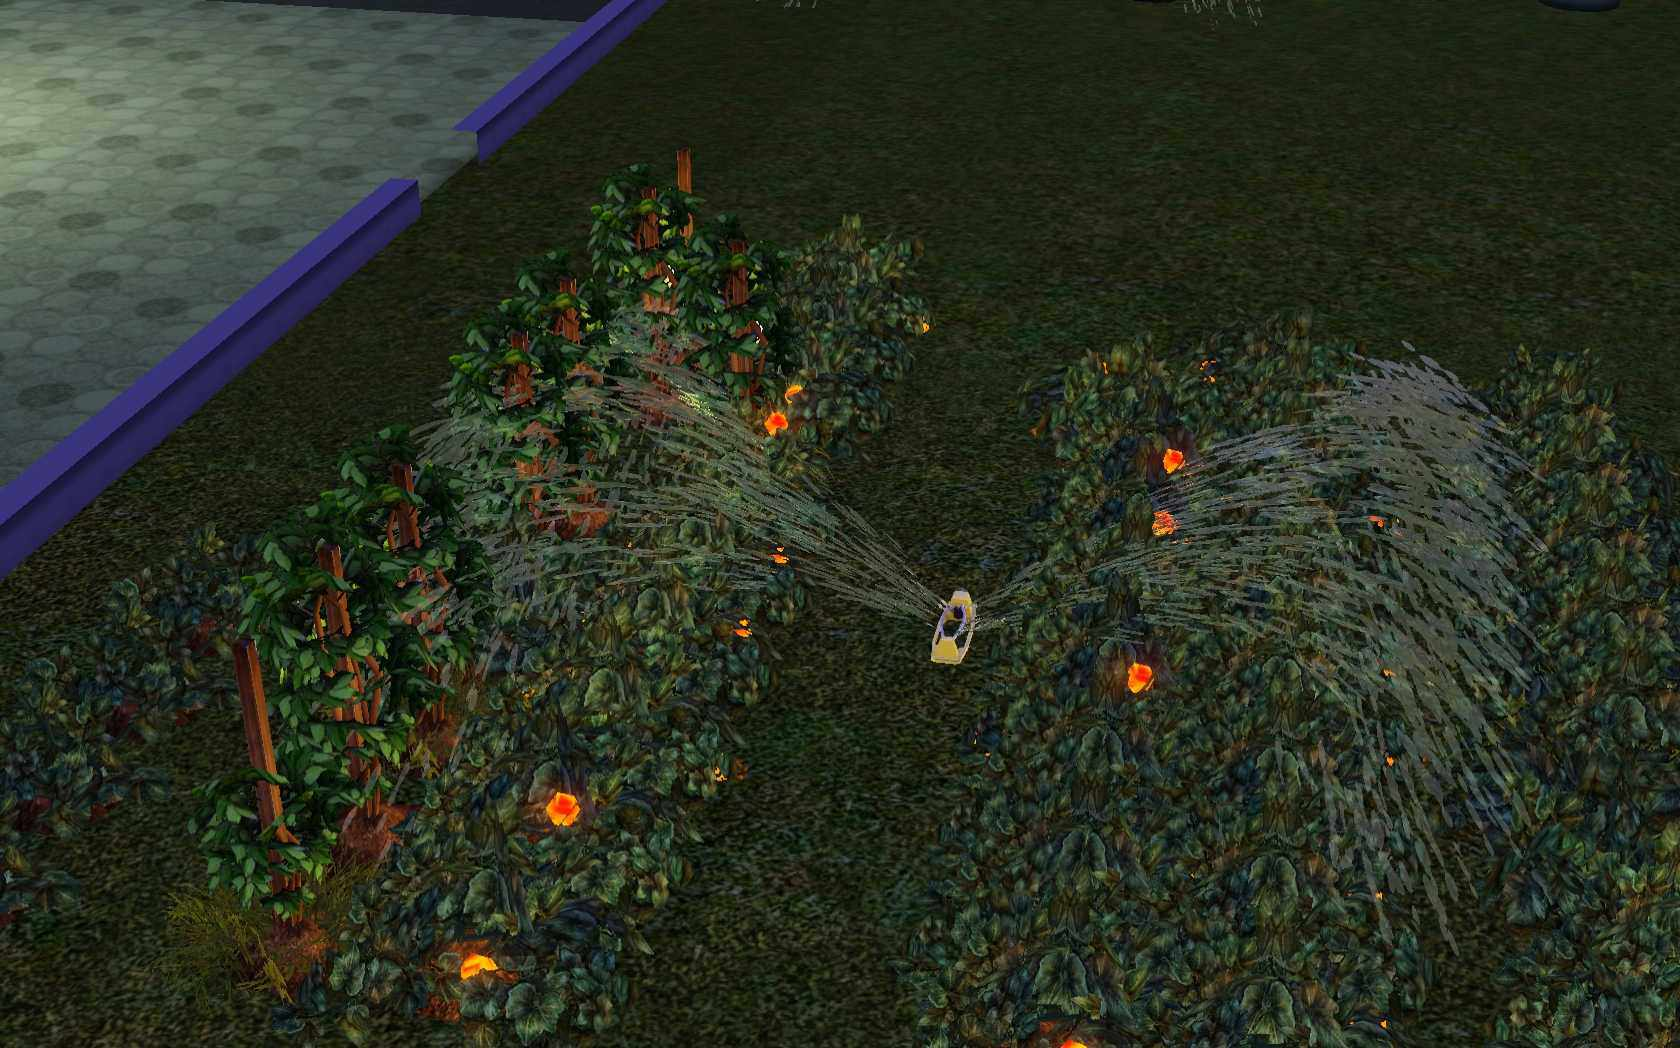 The Sims 3 Gardening Skill